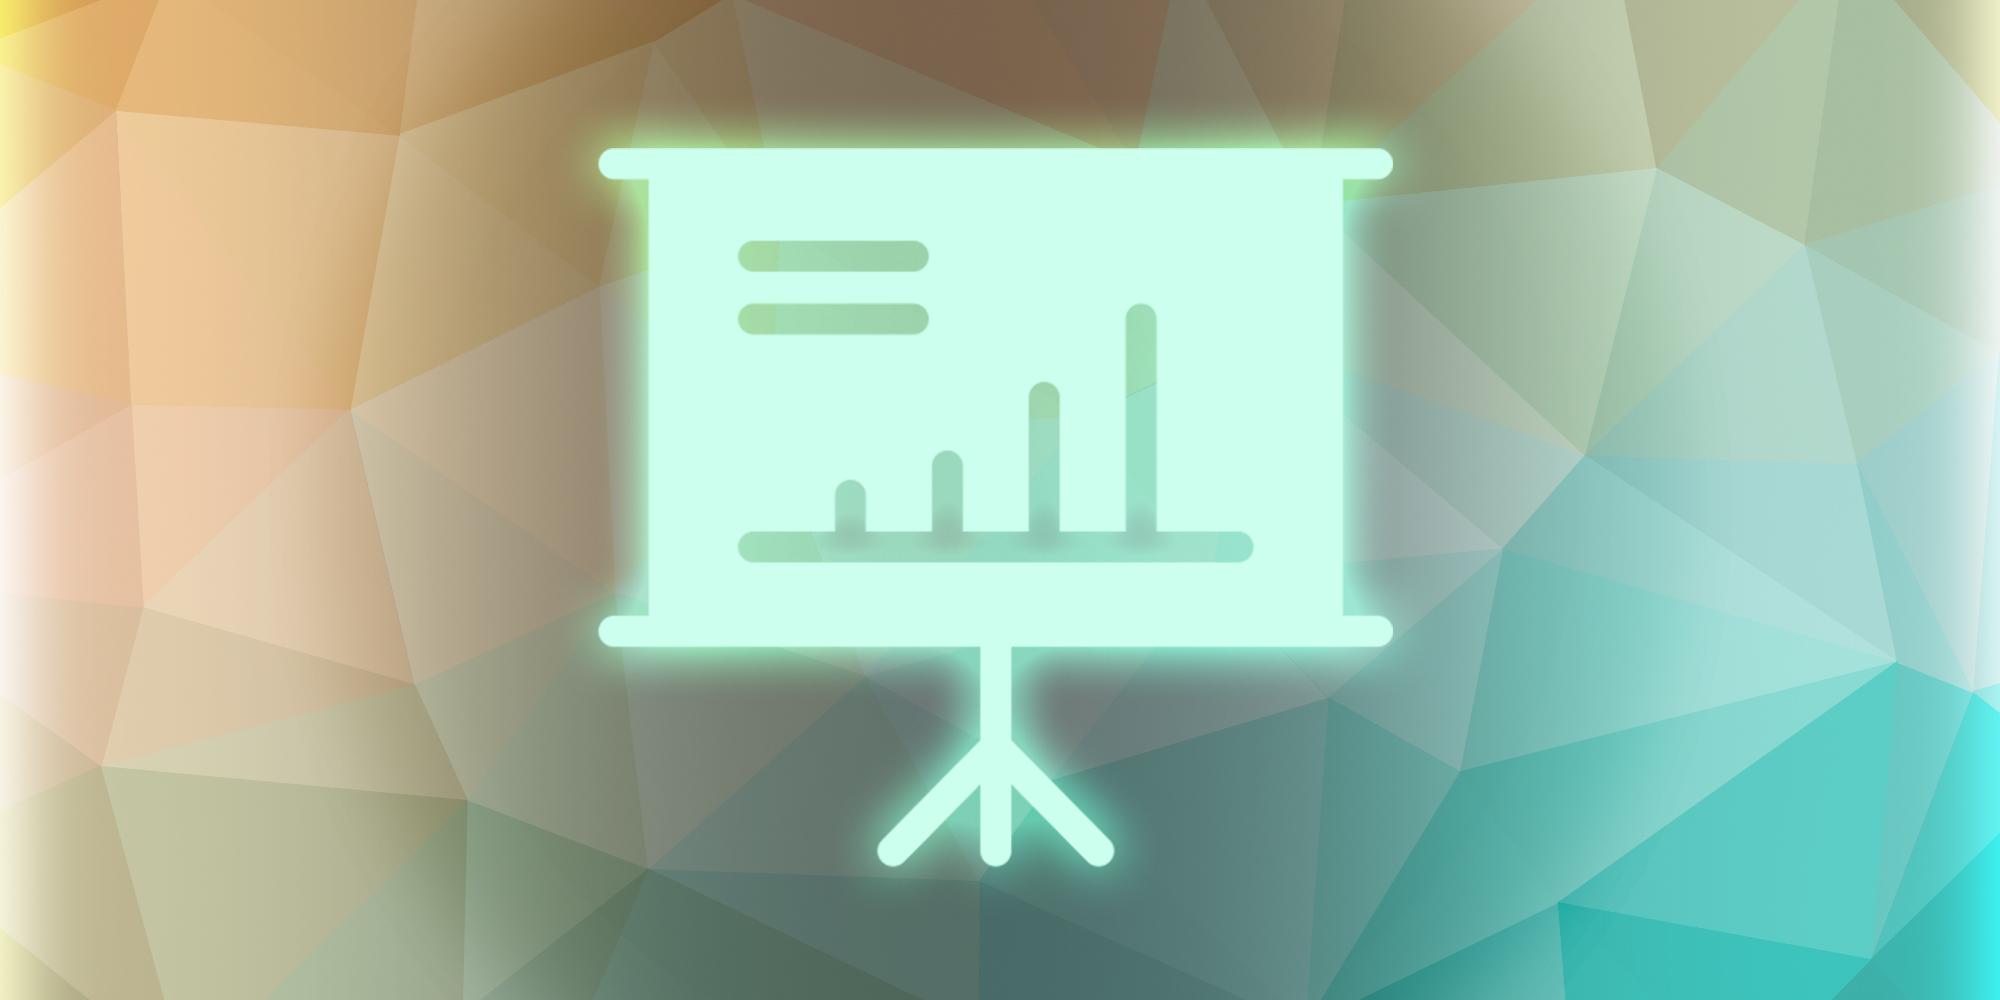 022_Ideate, Validate then Start a Business of Social Venture.jpg